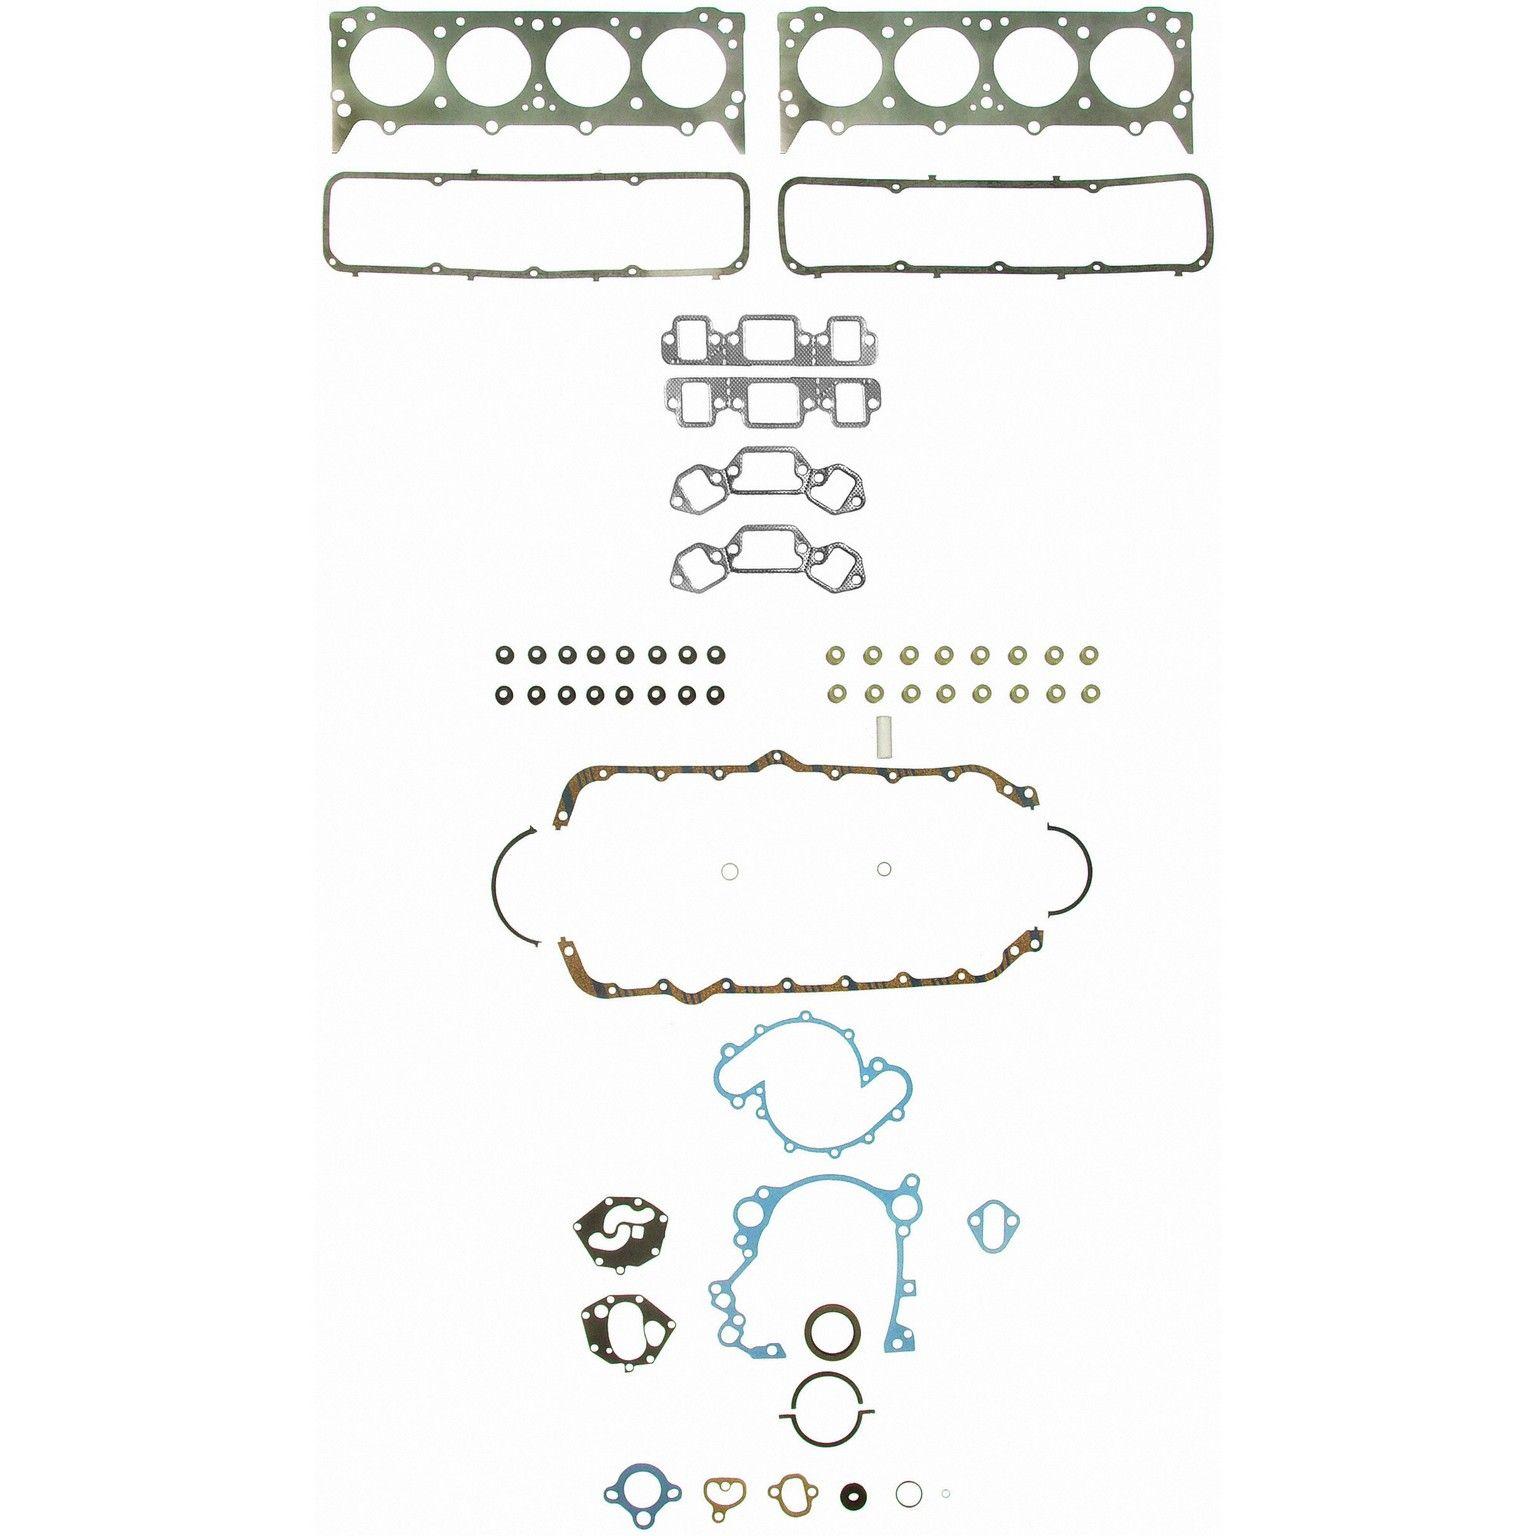 Jeep Cj7 Engine Gasket Set Replacement Felpro Sealed Power Victor Diagram 1976 8 Cyl 50l 260 1010 Int Manifold Gskt Not Incl Premium Valve Stem Seals